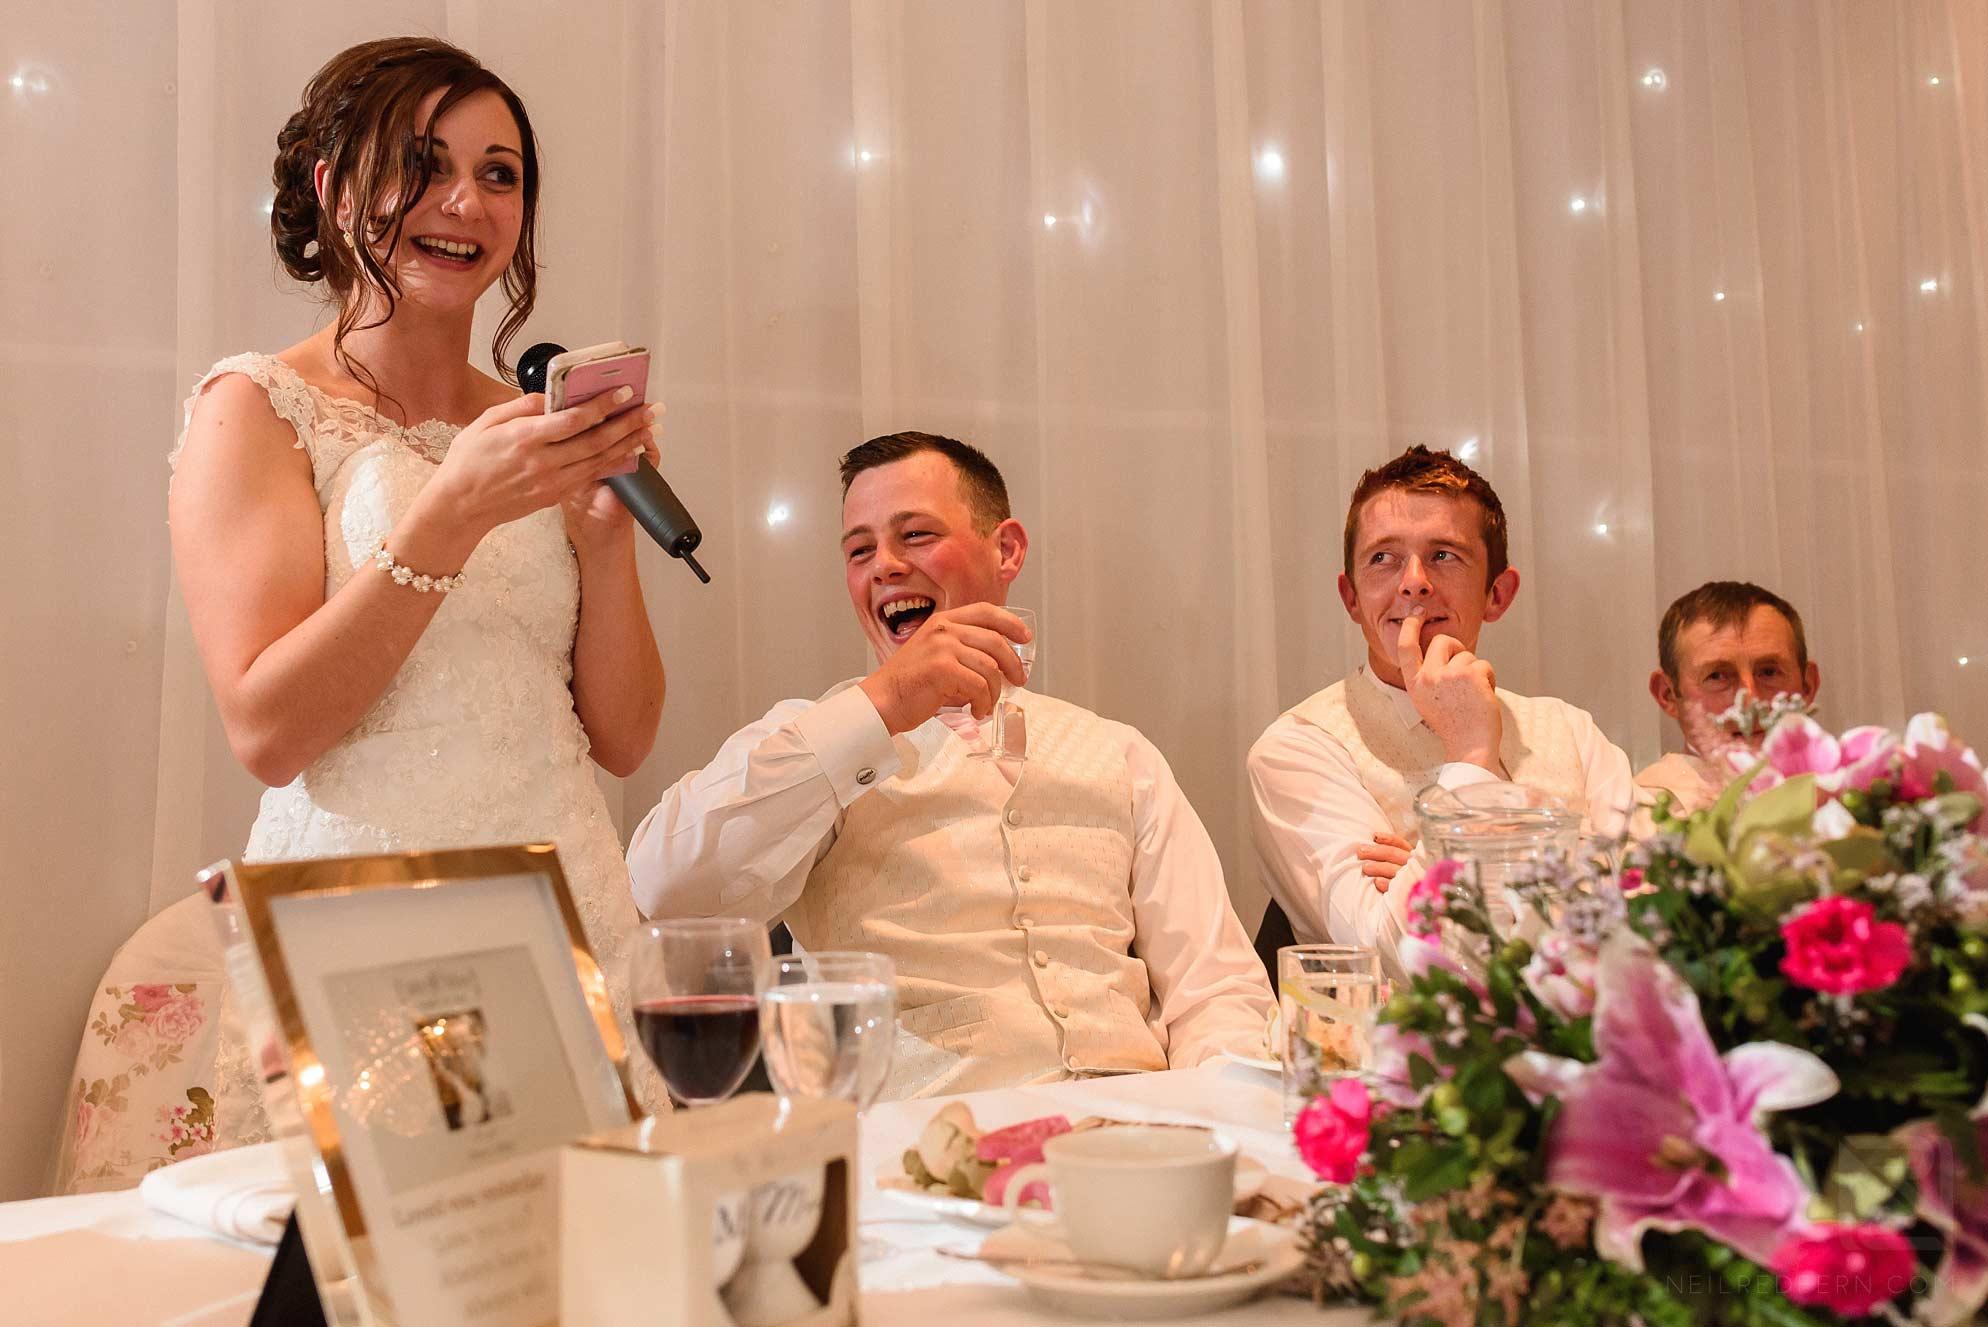 Metropole-Hotel-Llandrindod-Wells-wedding-29